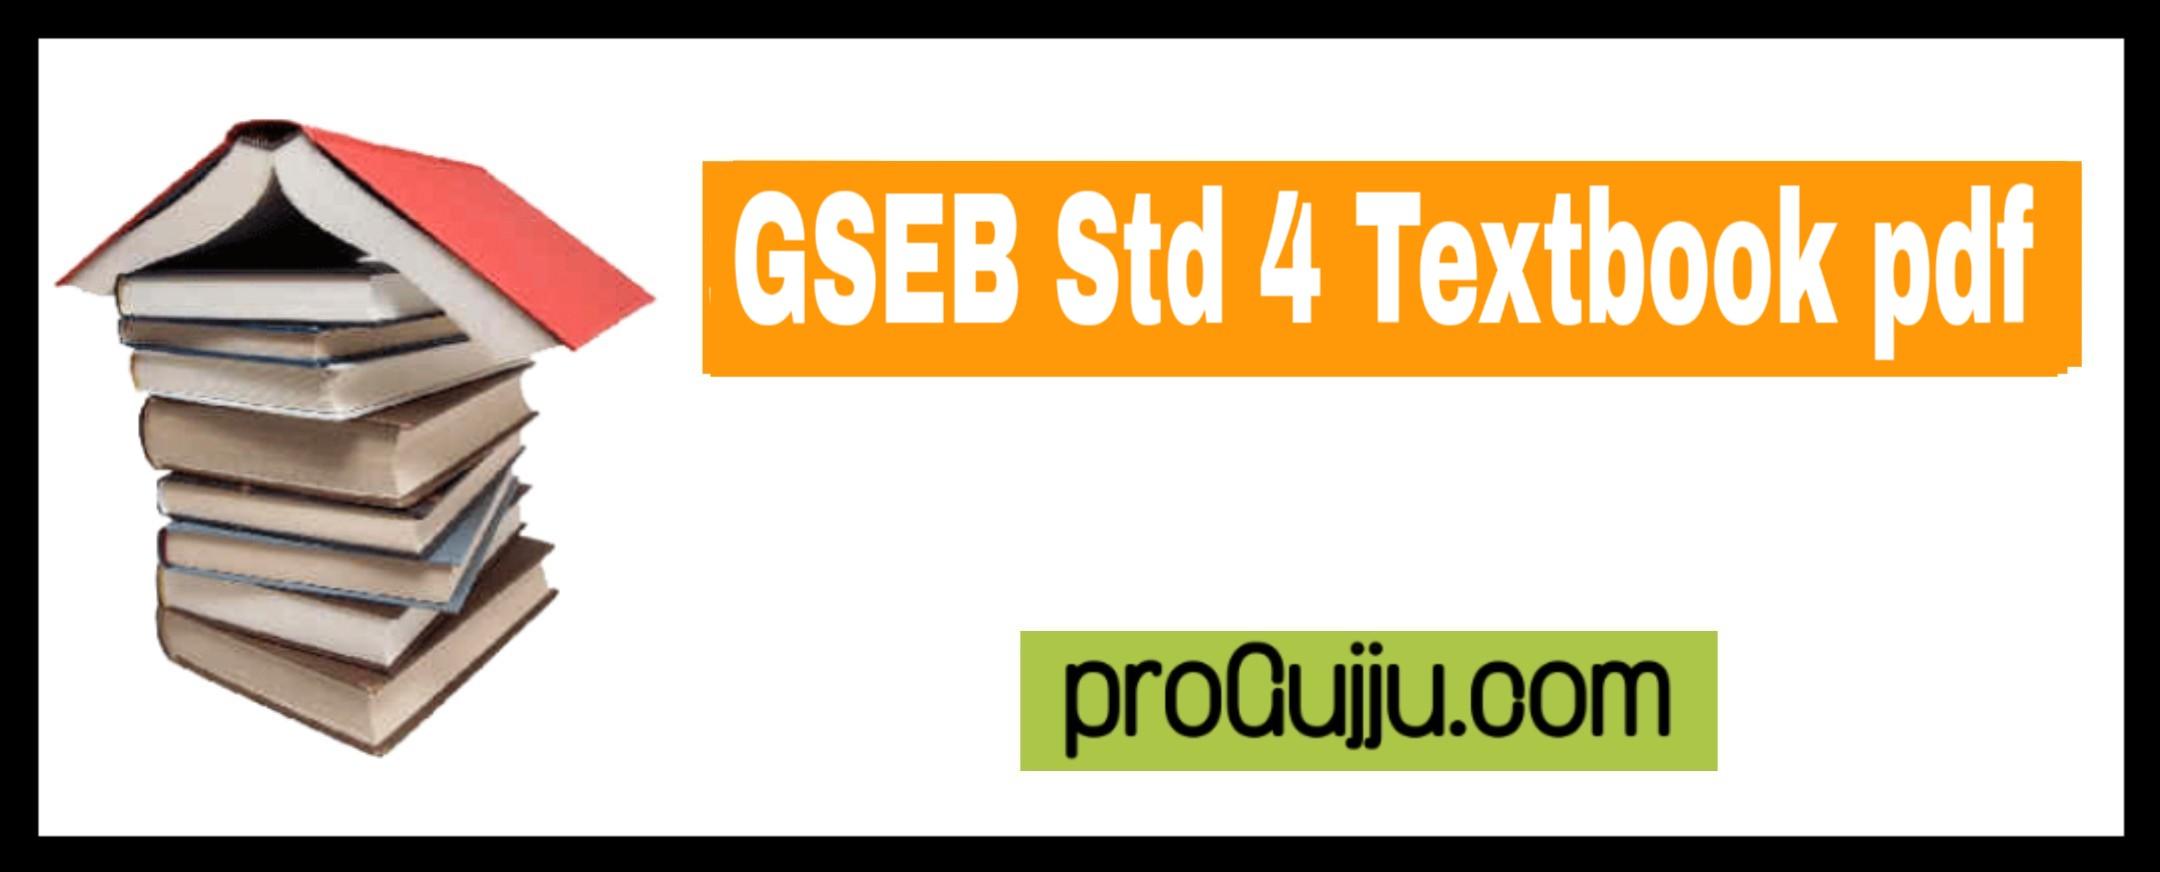 GSEB Std 4 Textbook pdf